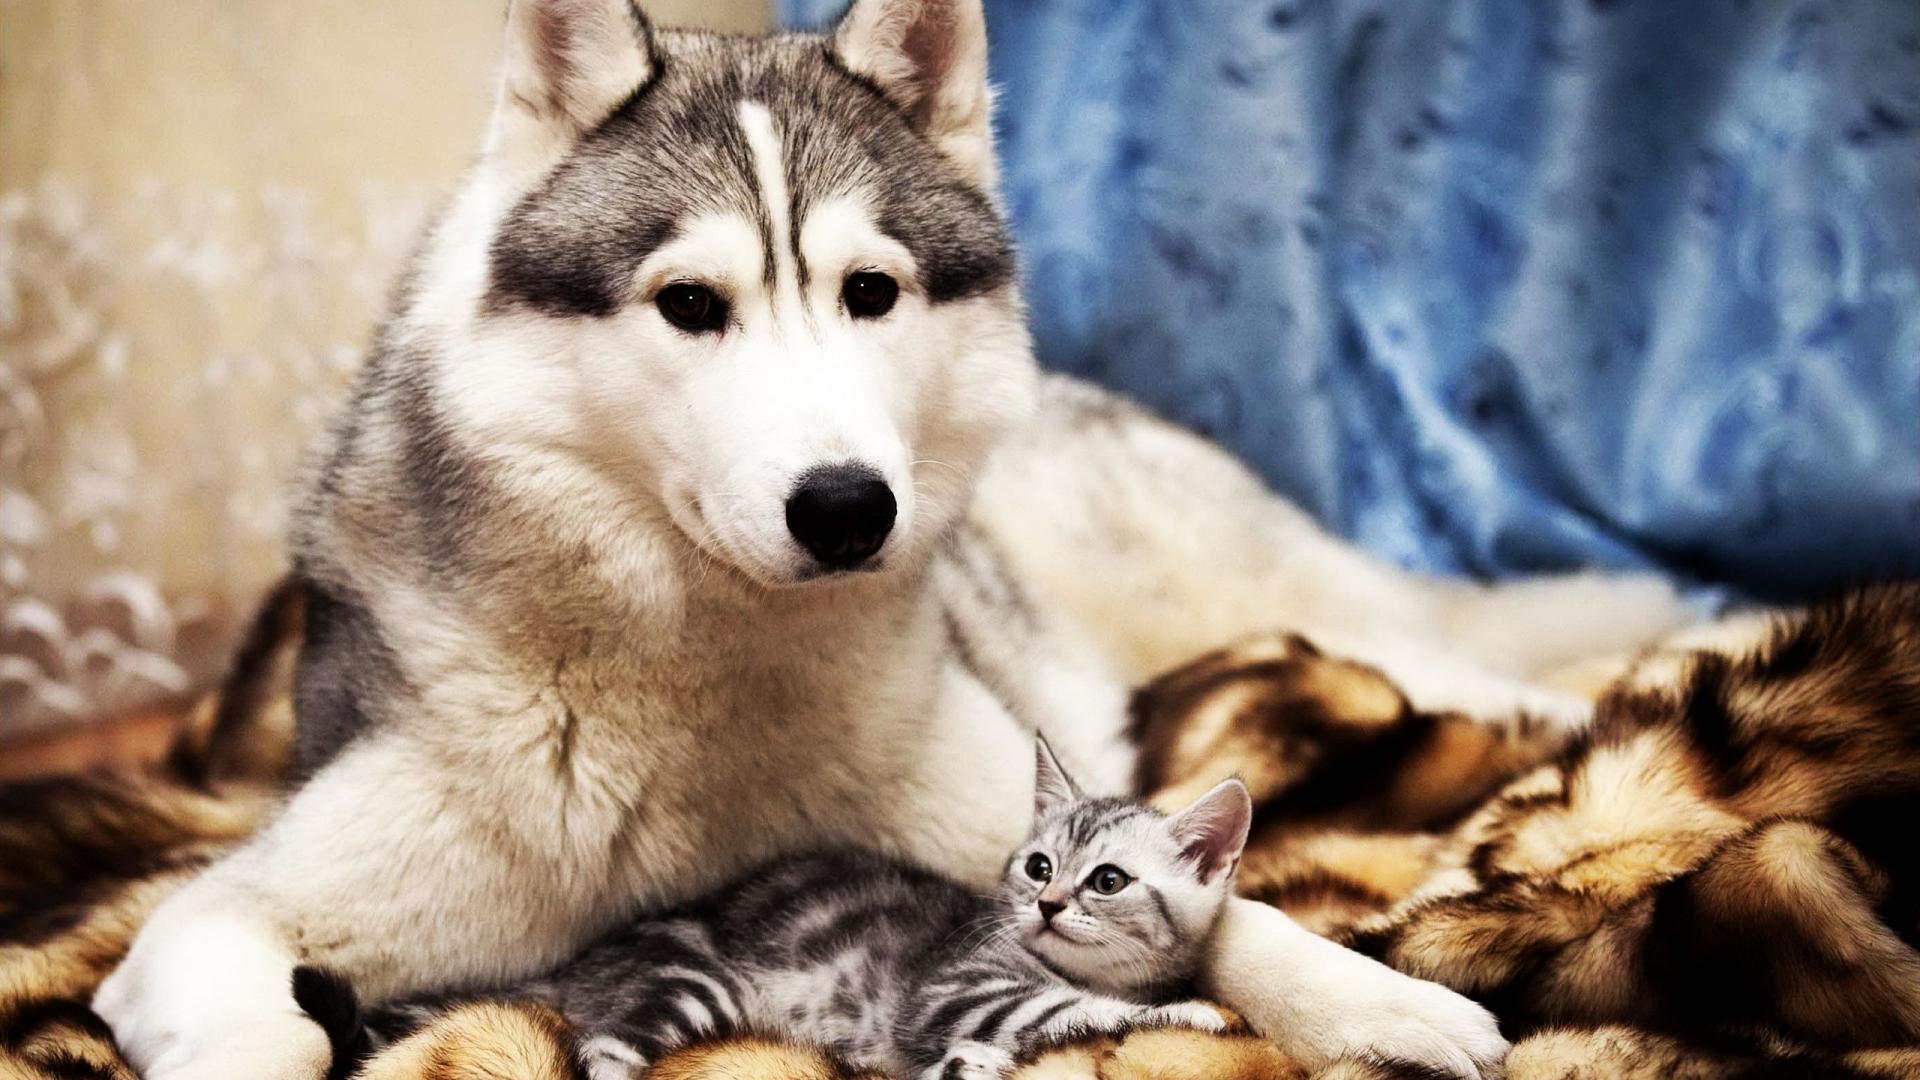 cute animals hd